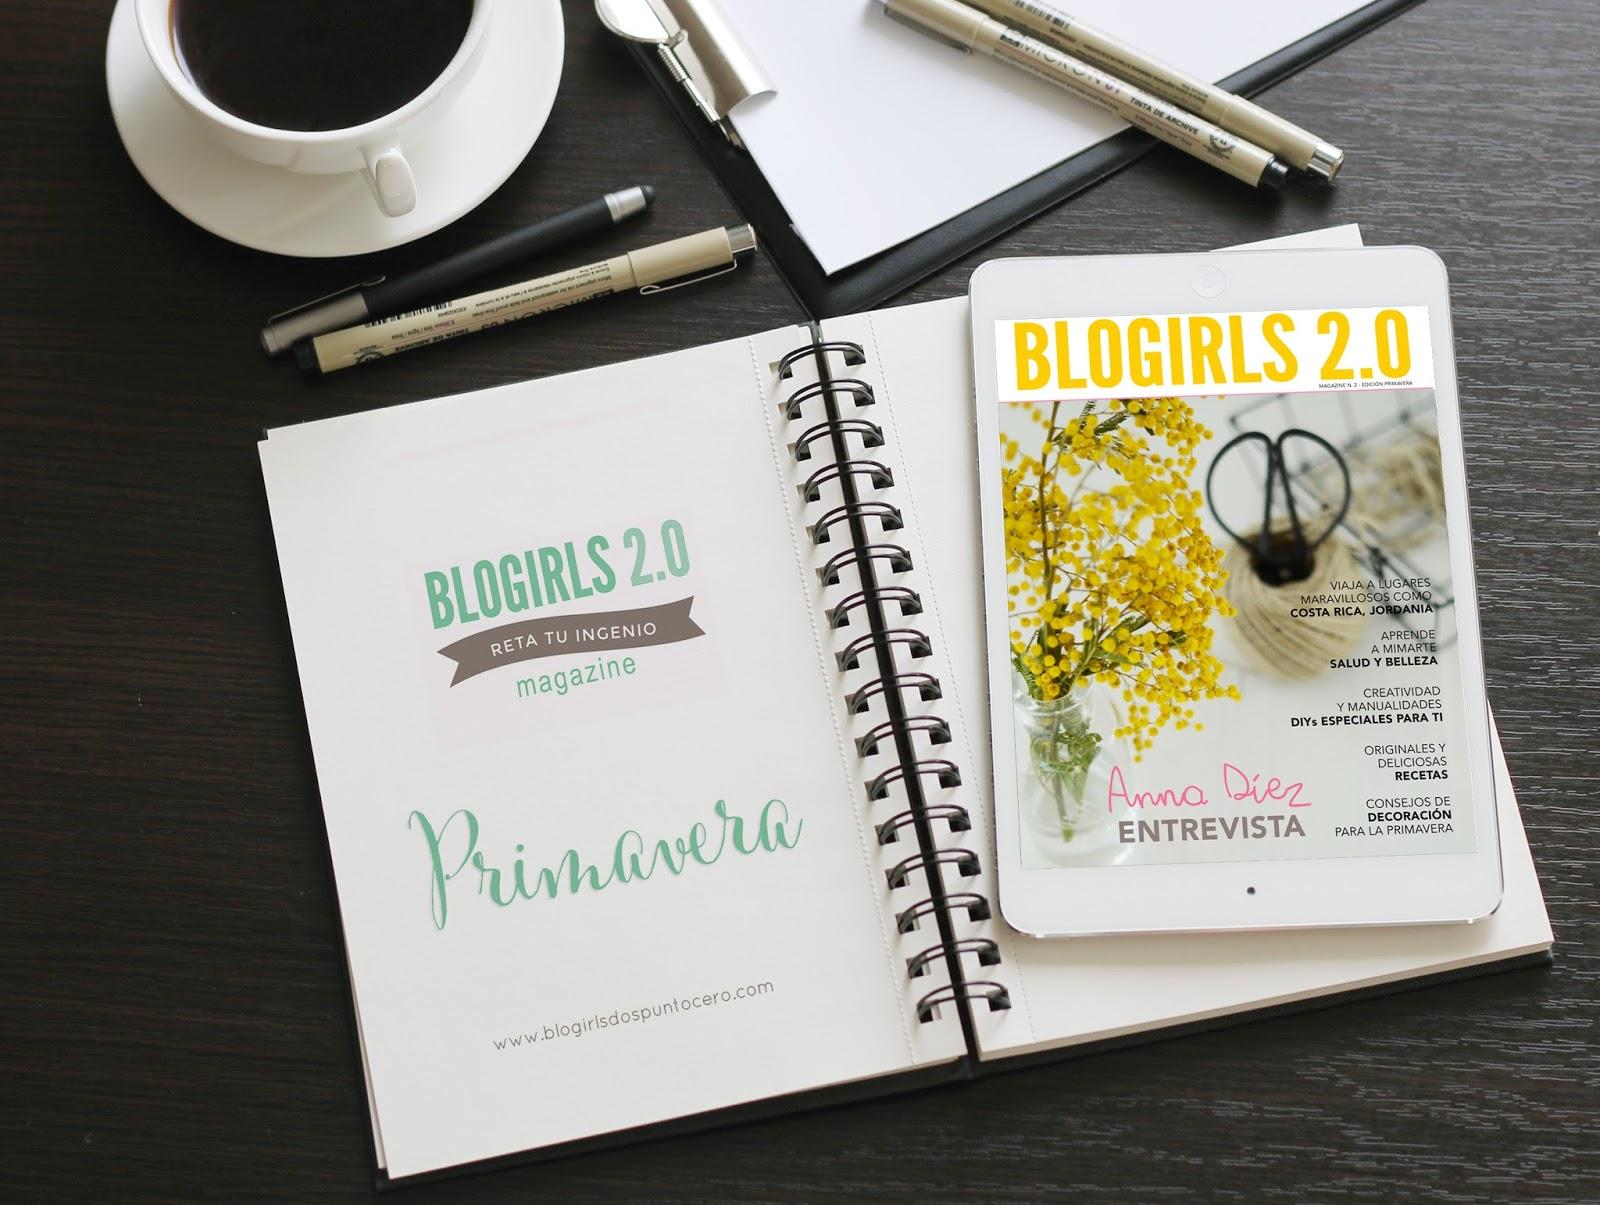 Edición primavera Blogirls 2.0 Magazine